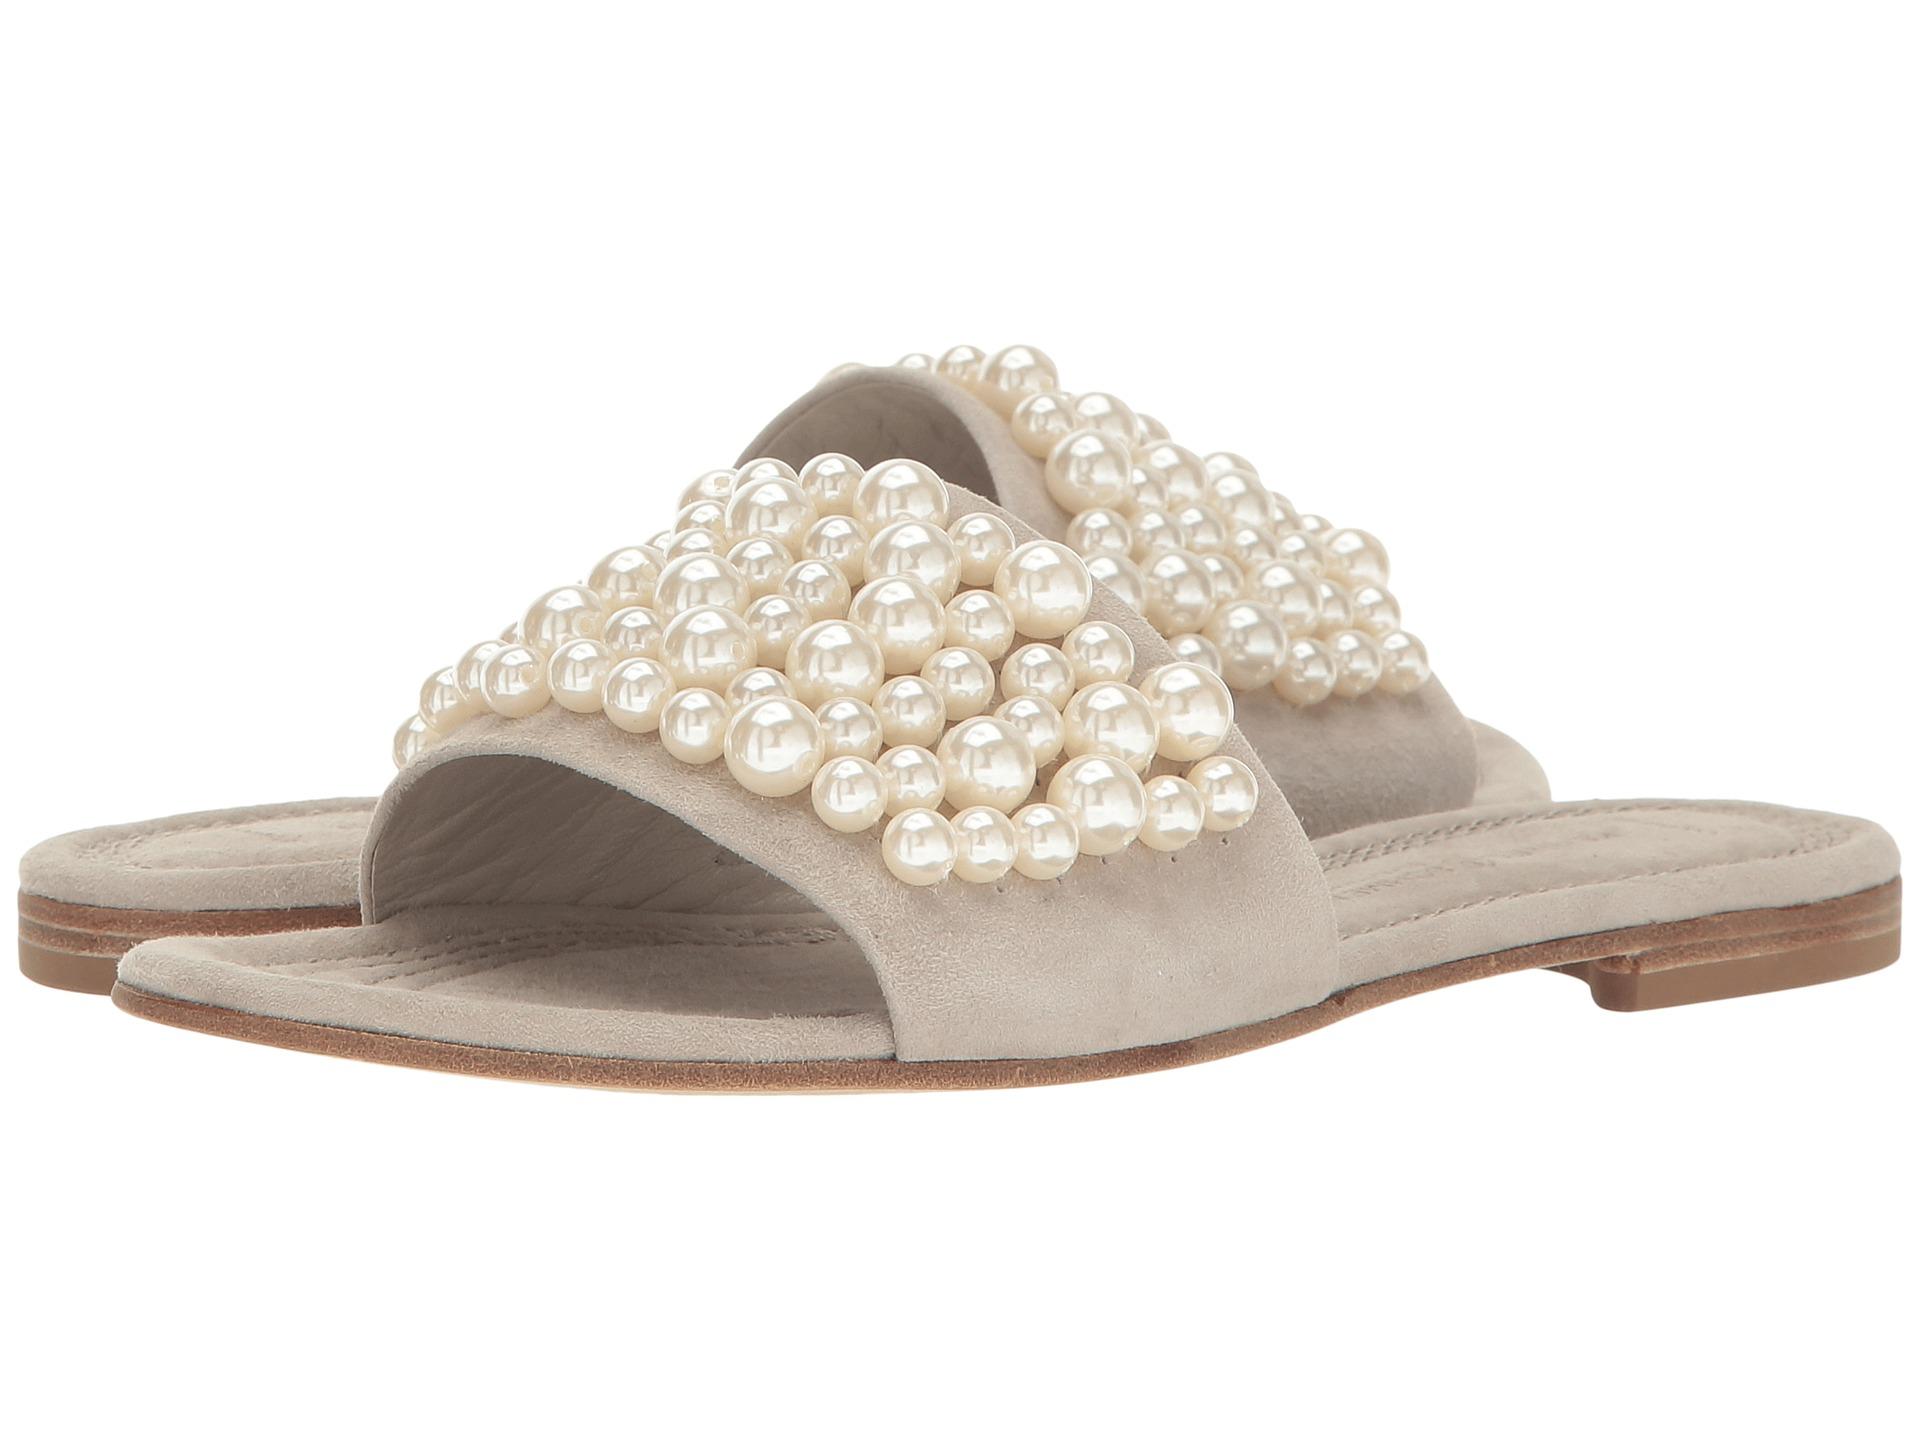 Kennel & Schmenger Pearl Slide Sandal